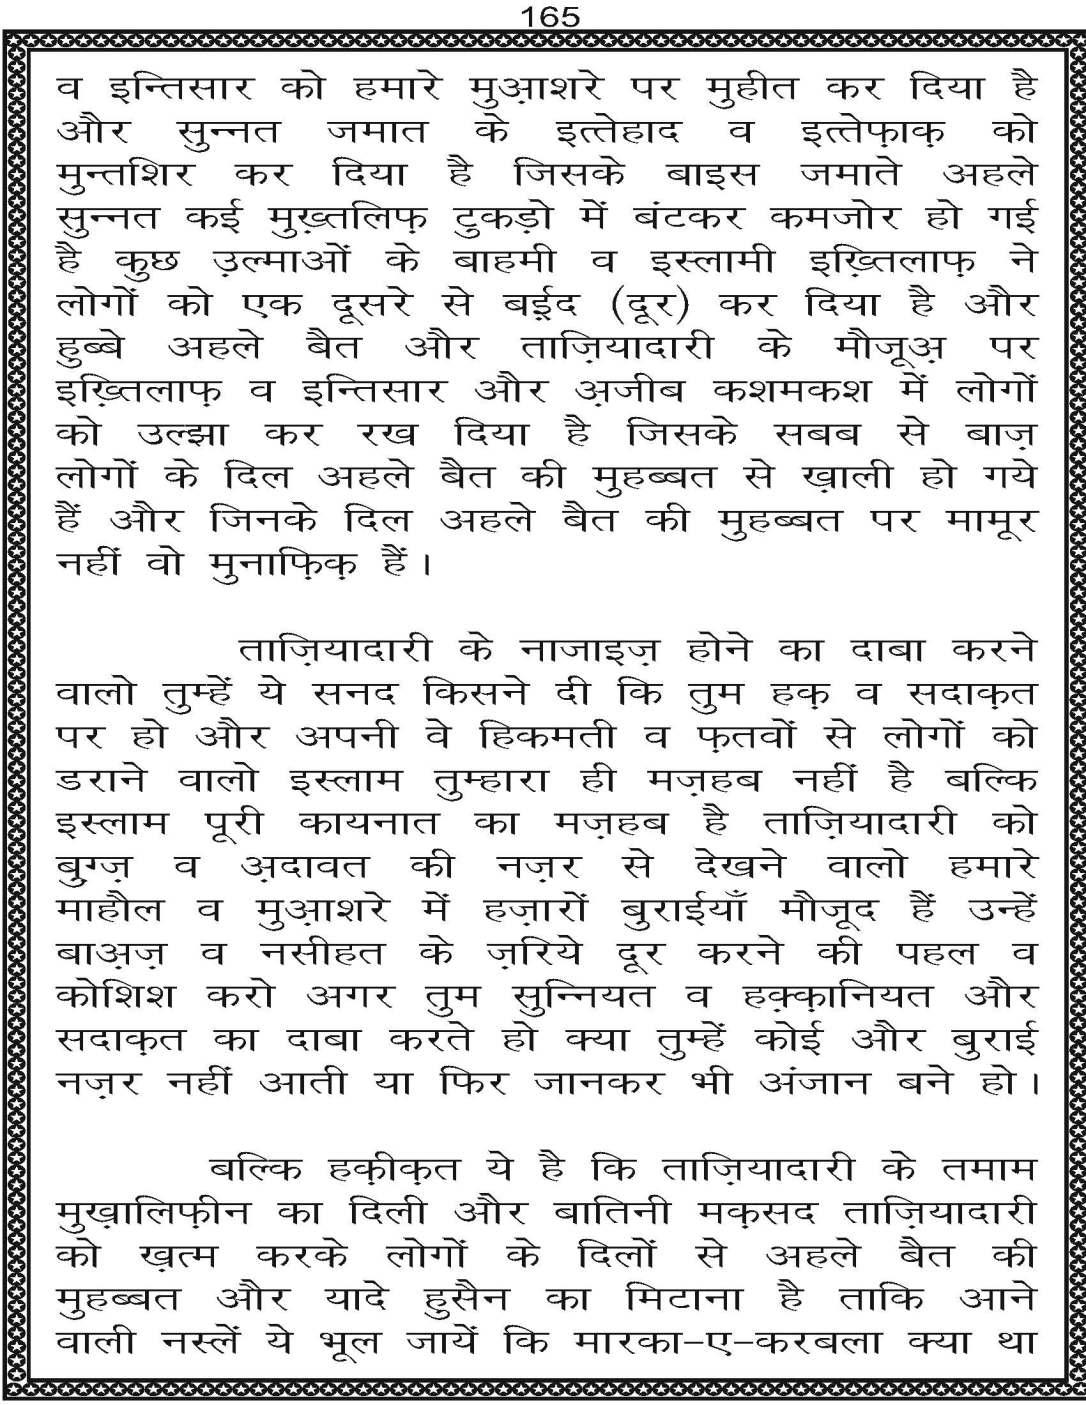 AzmateTaziyadari_Page_165